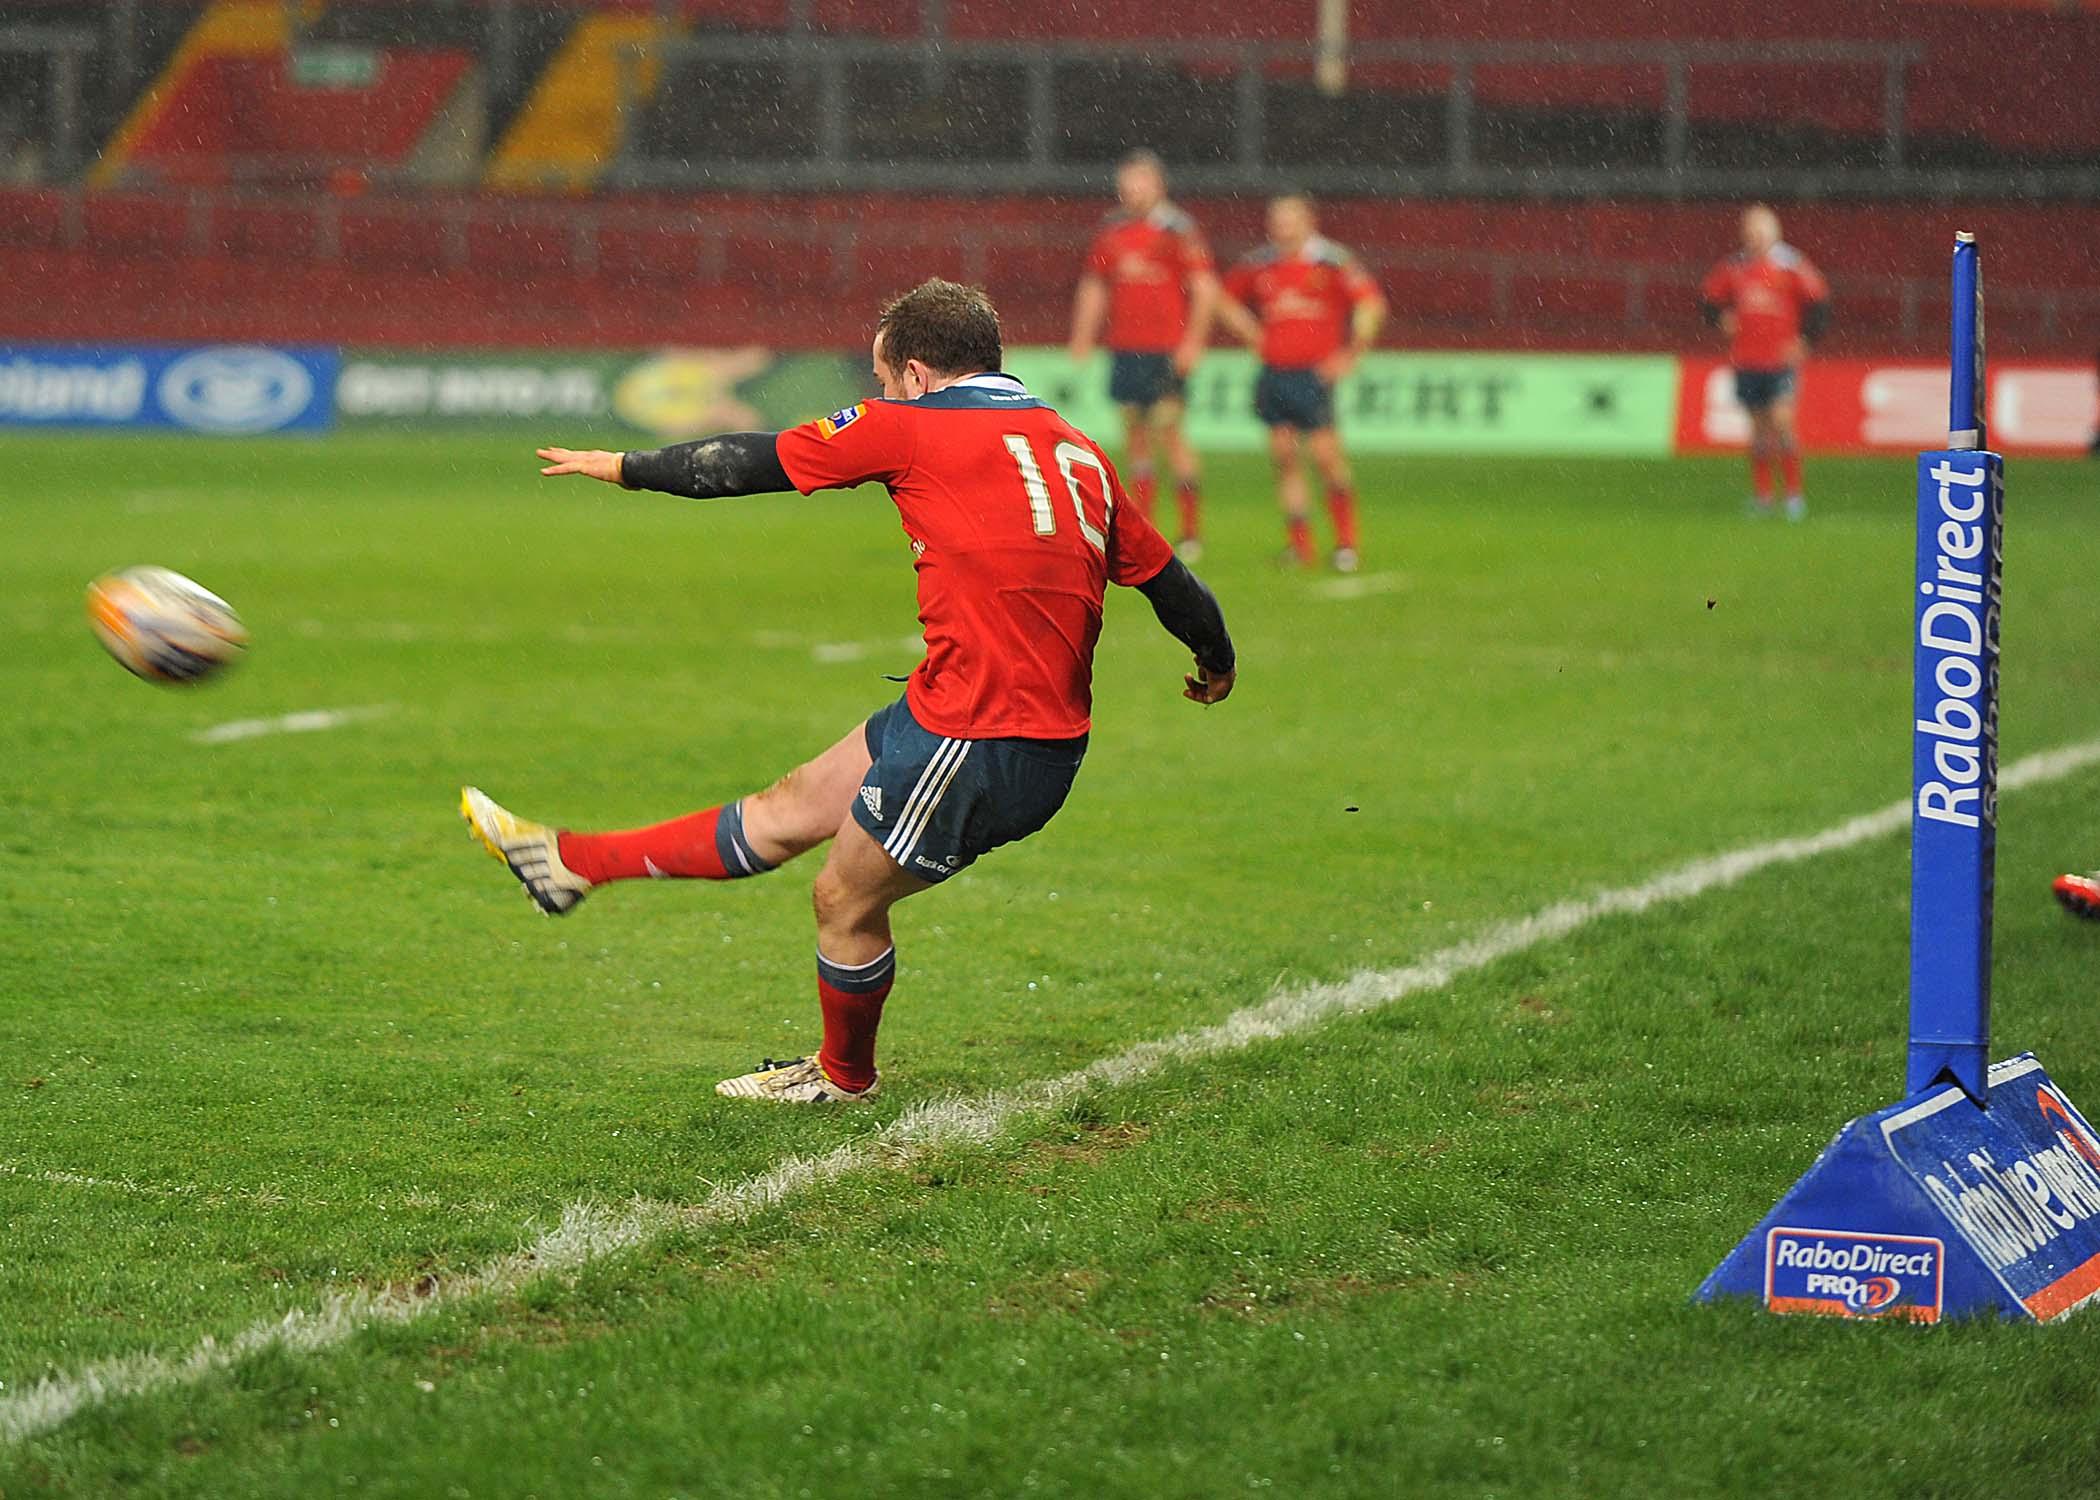 Ian Keatley, Munster, in action